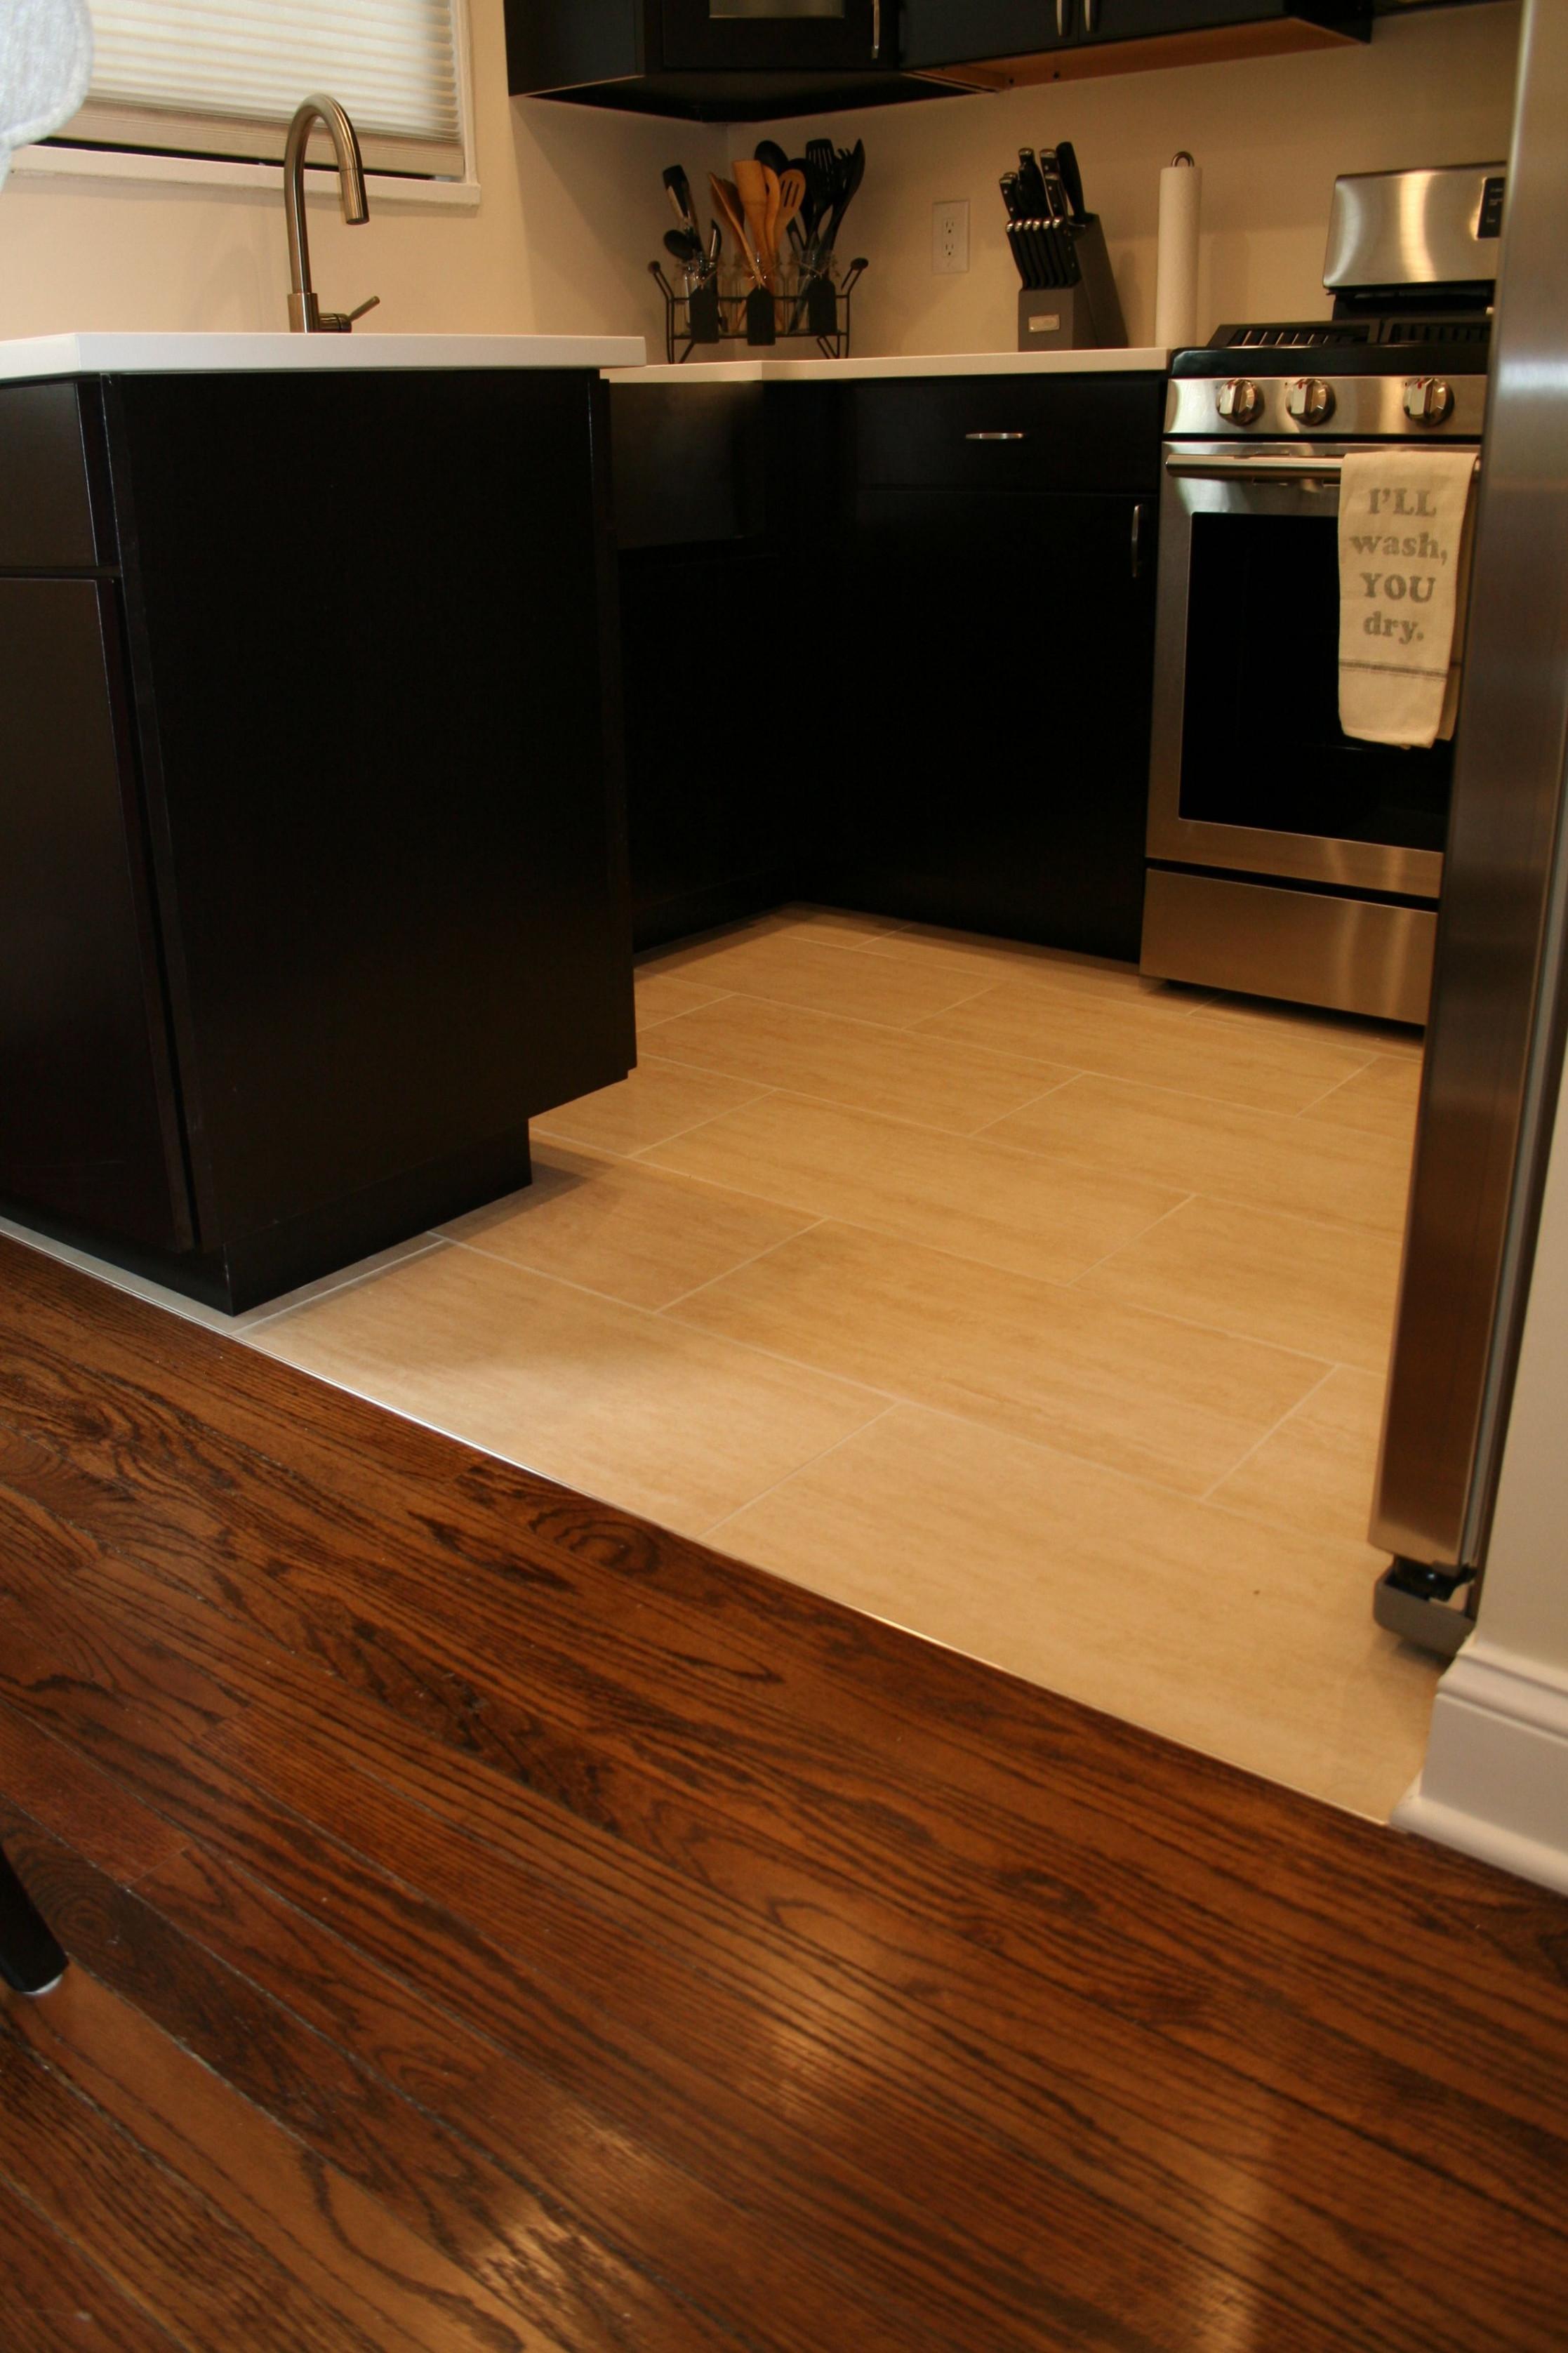 hardwood floors with dark kitchen cabinets of what tile is best for kitchen floor and not dark jackolanternliquors inside transition from tile to wood floors light to dark flooring kitchen cabinetsml